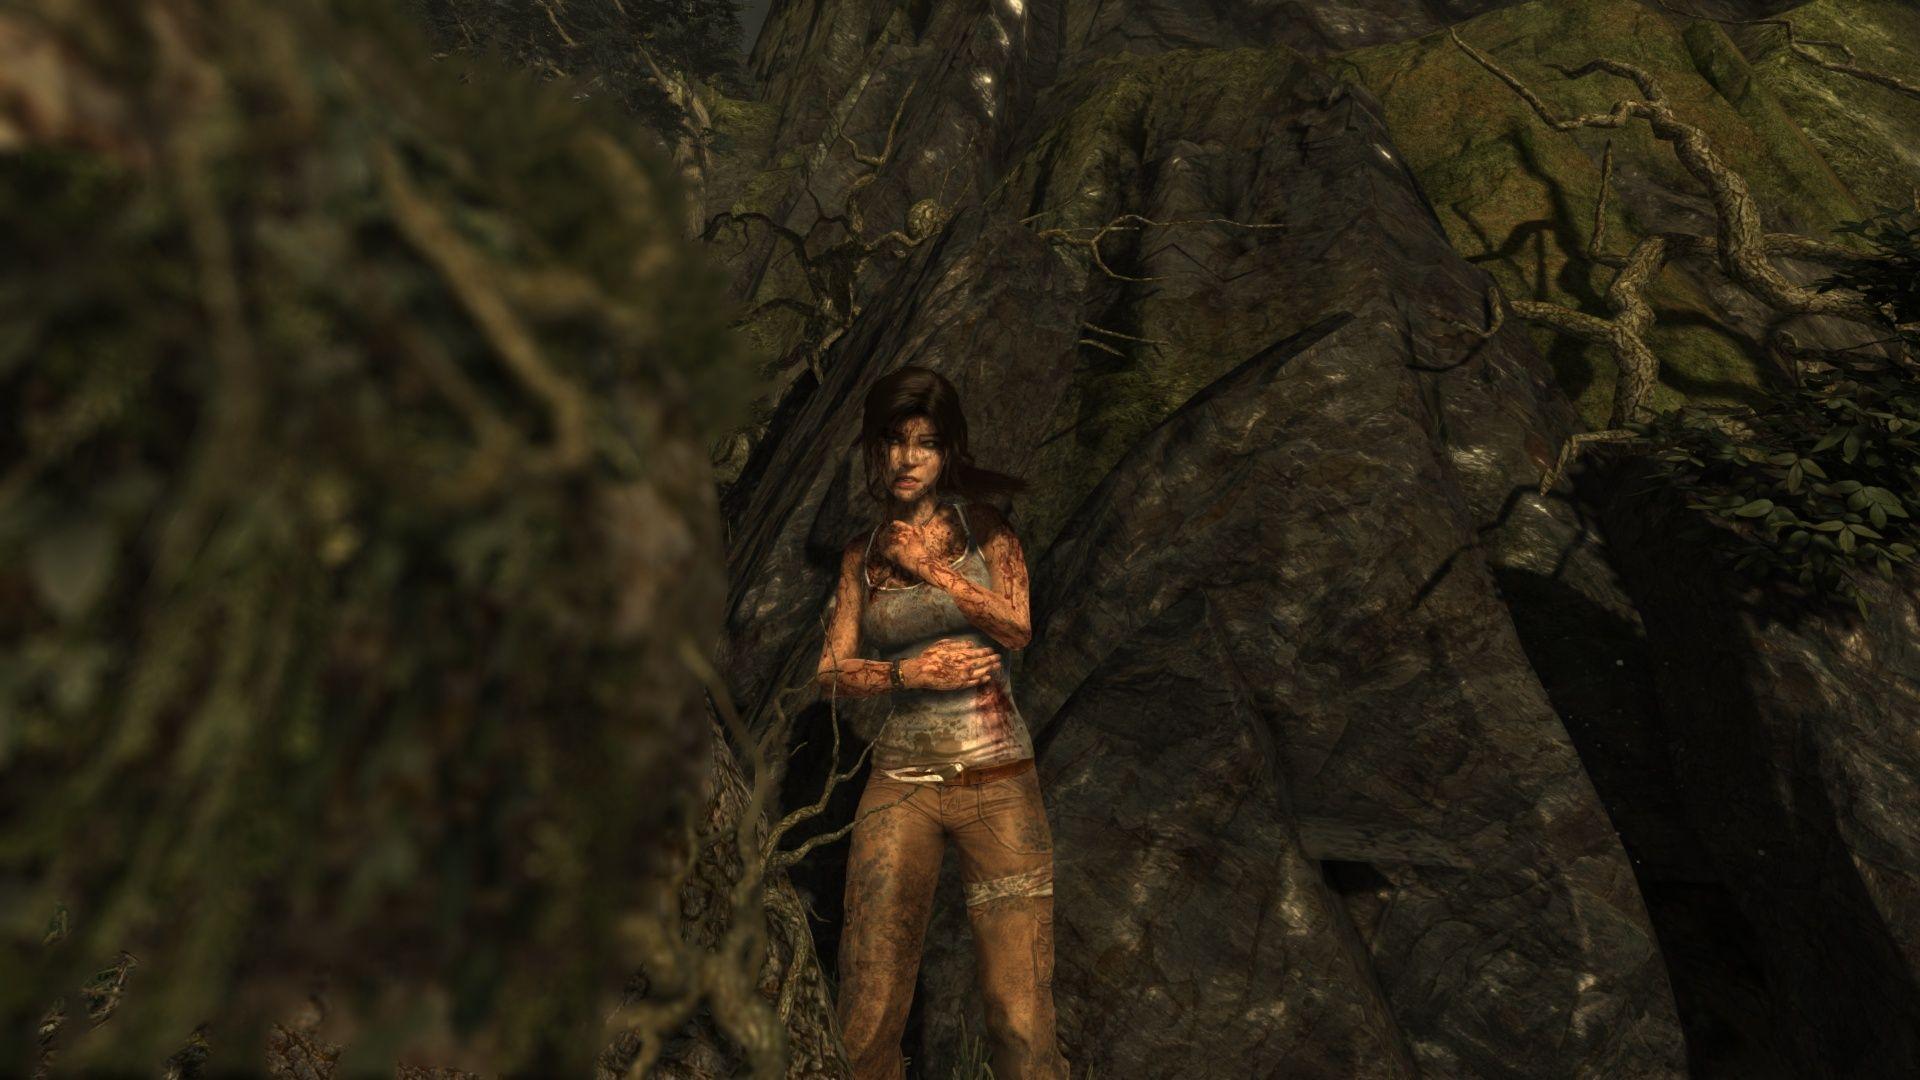 Tomb raider  (2013) - Page 3 Dddd10